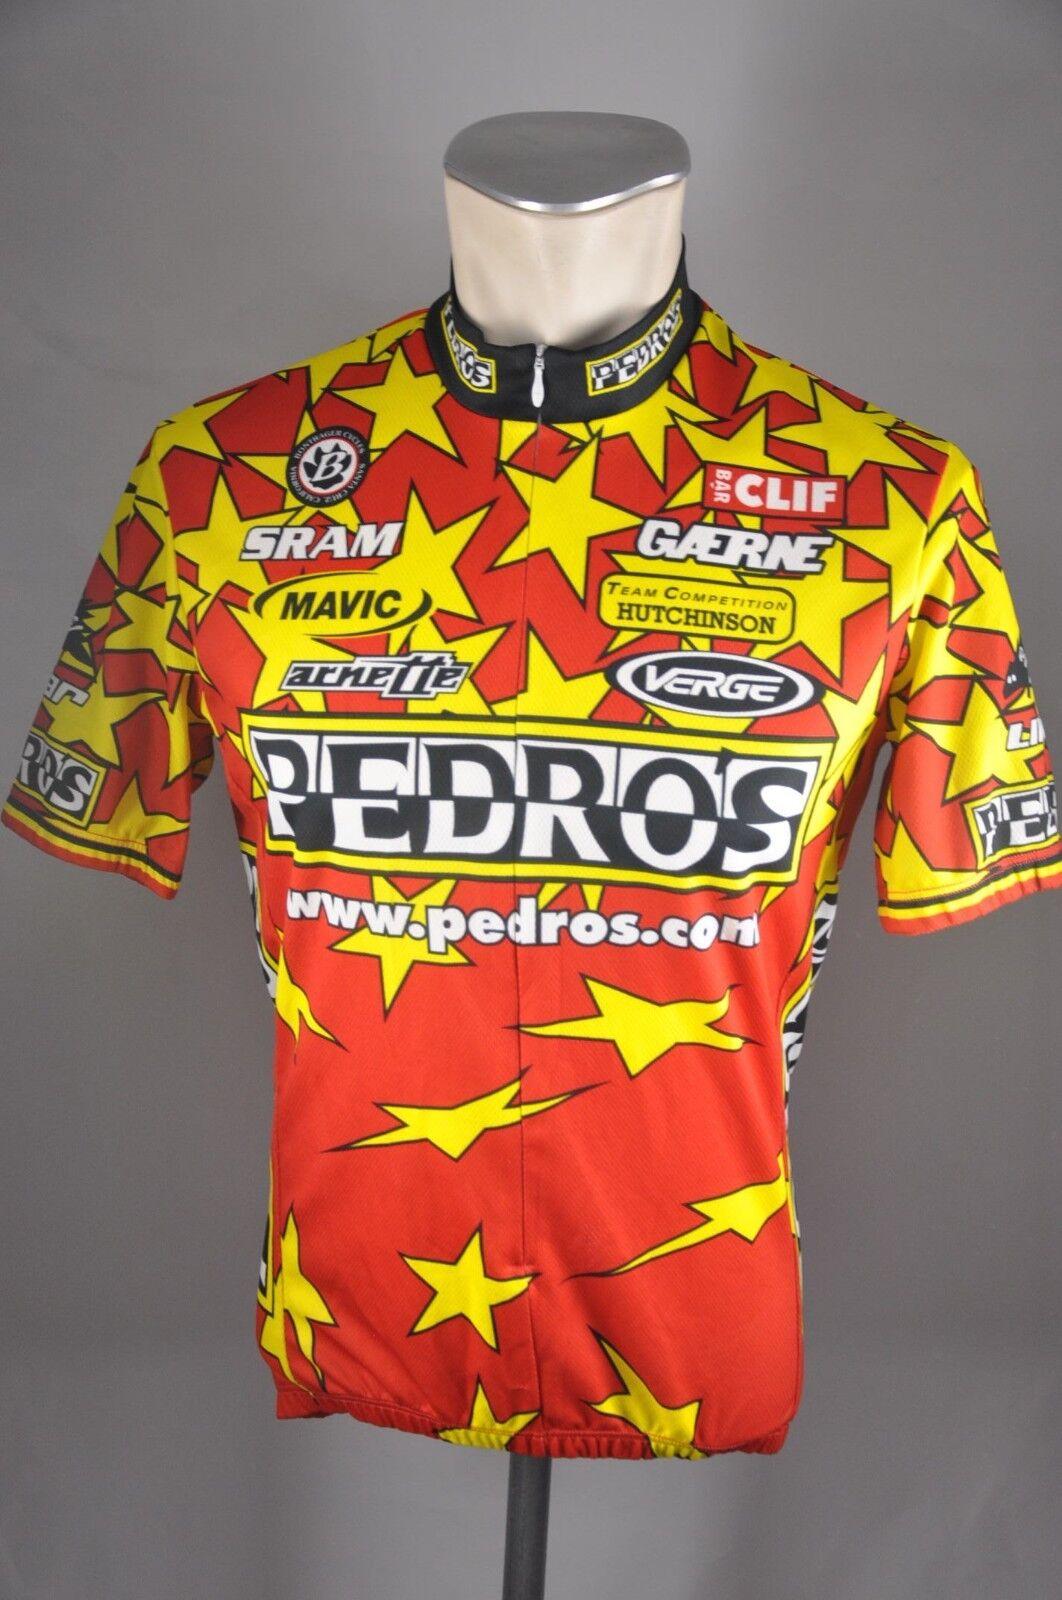 Pedros Verge Trikot Gr. M 52cm bike maglia cycling jersey L2